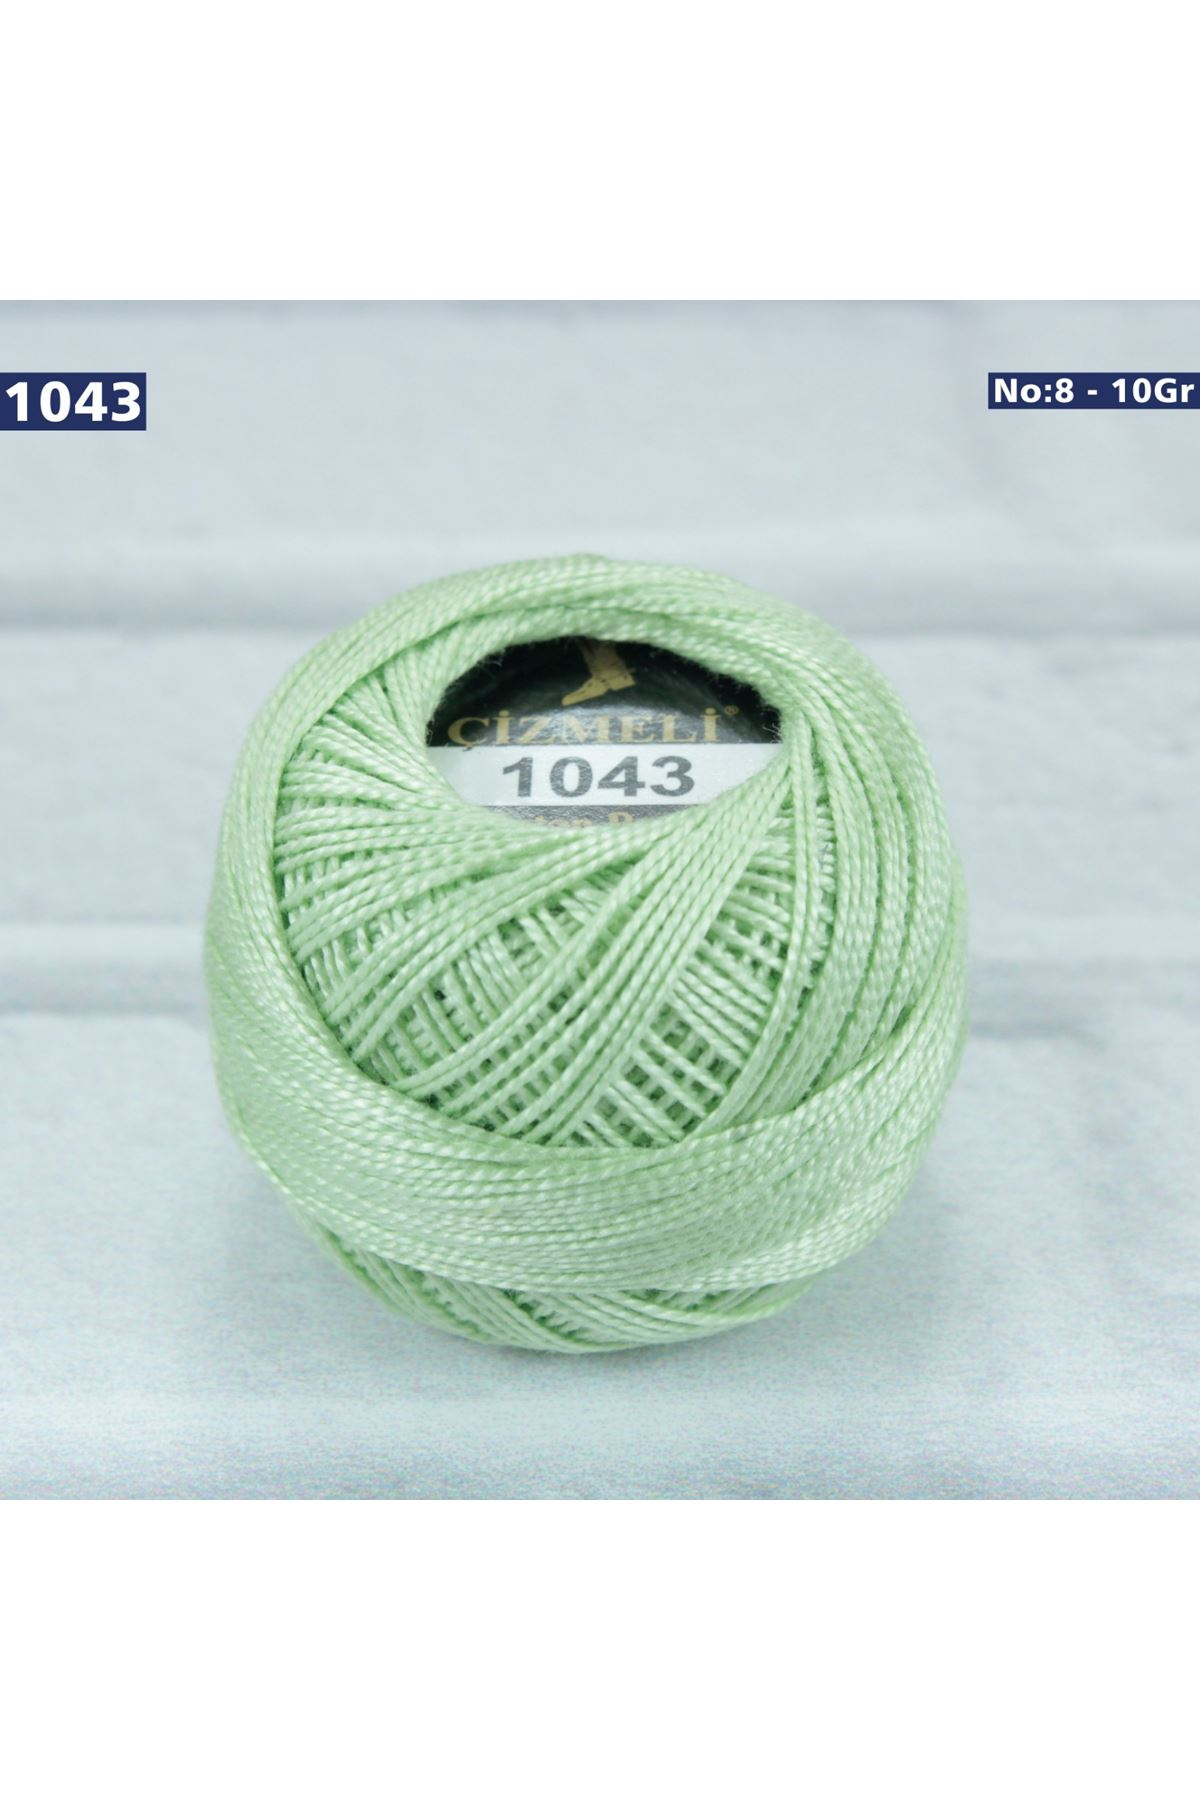 Çizmeli Cotton Perle Nakış İpliği No: 1043